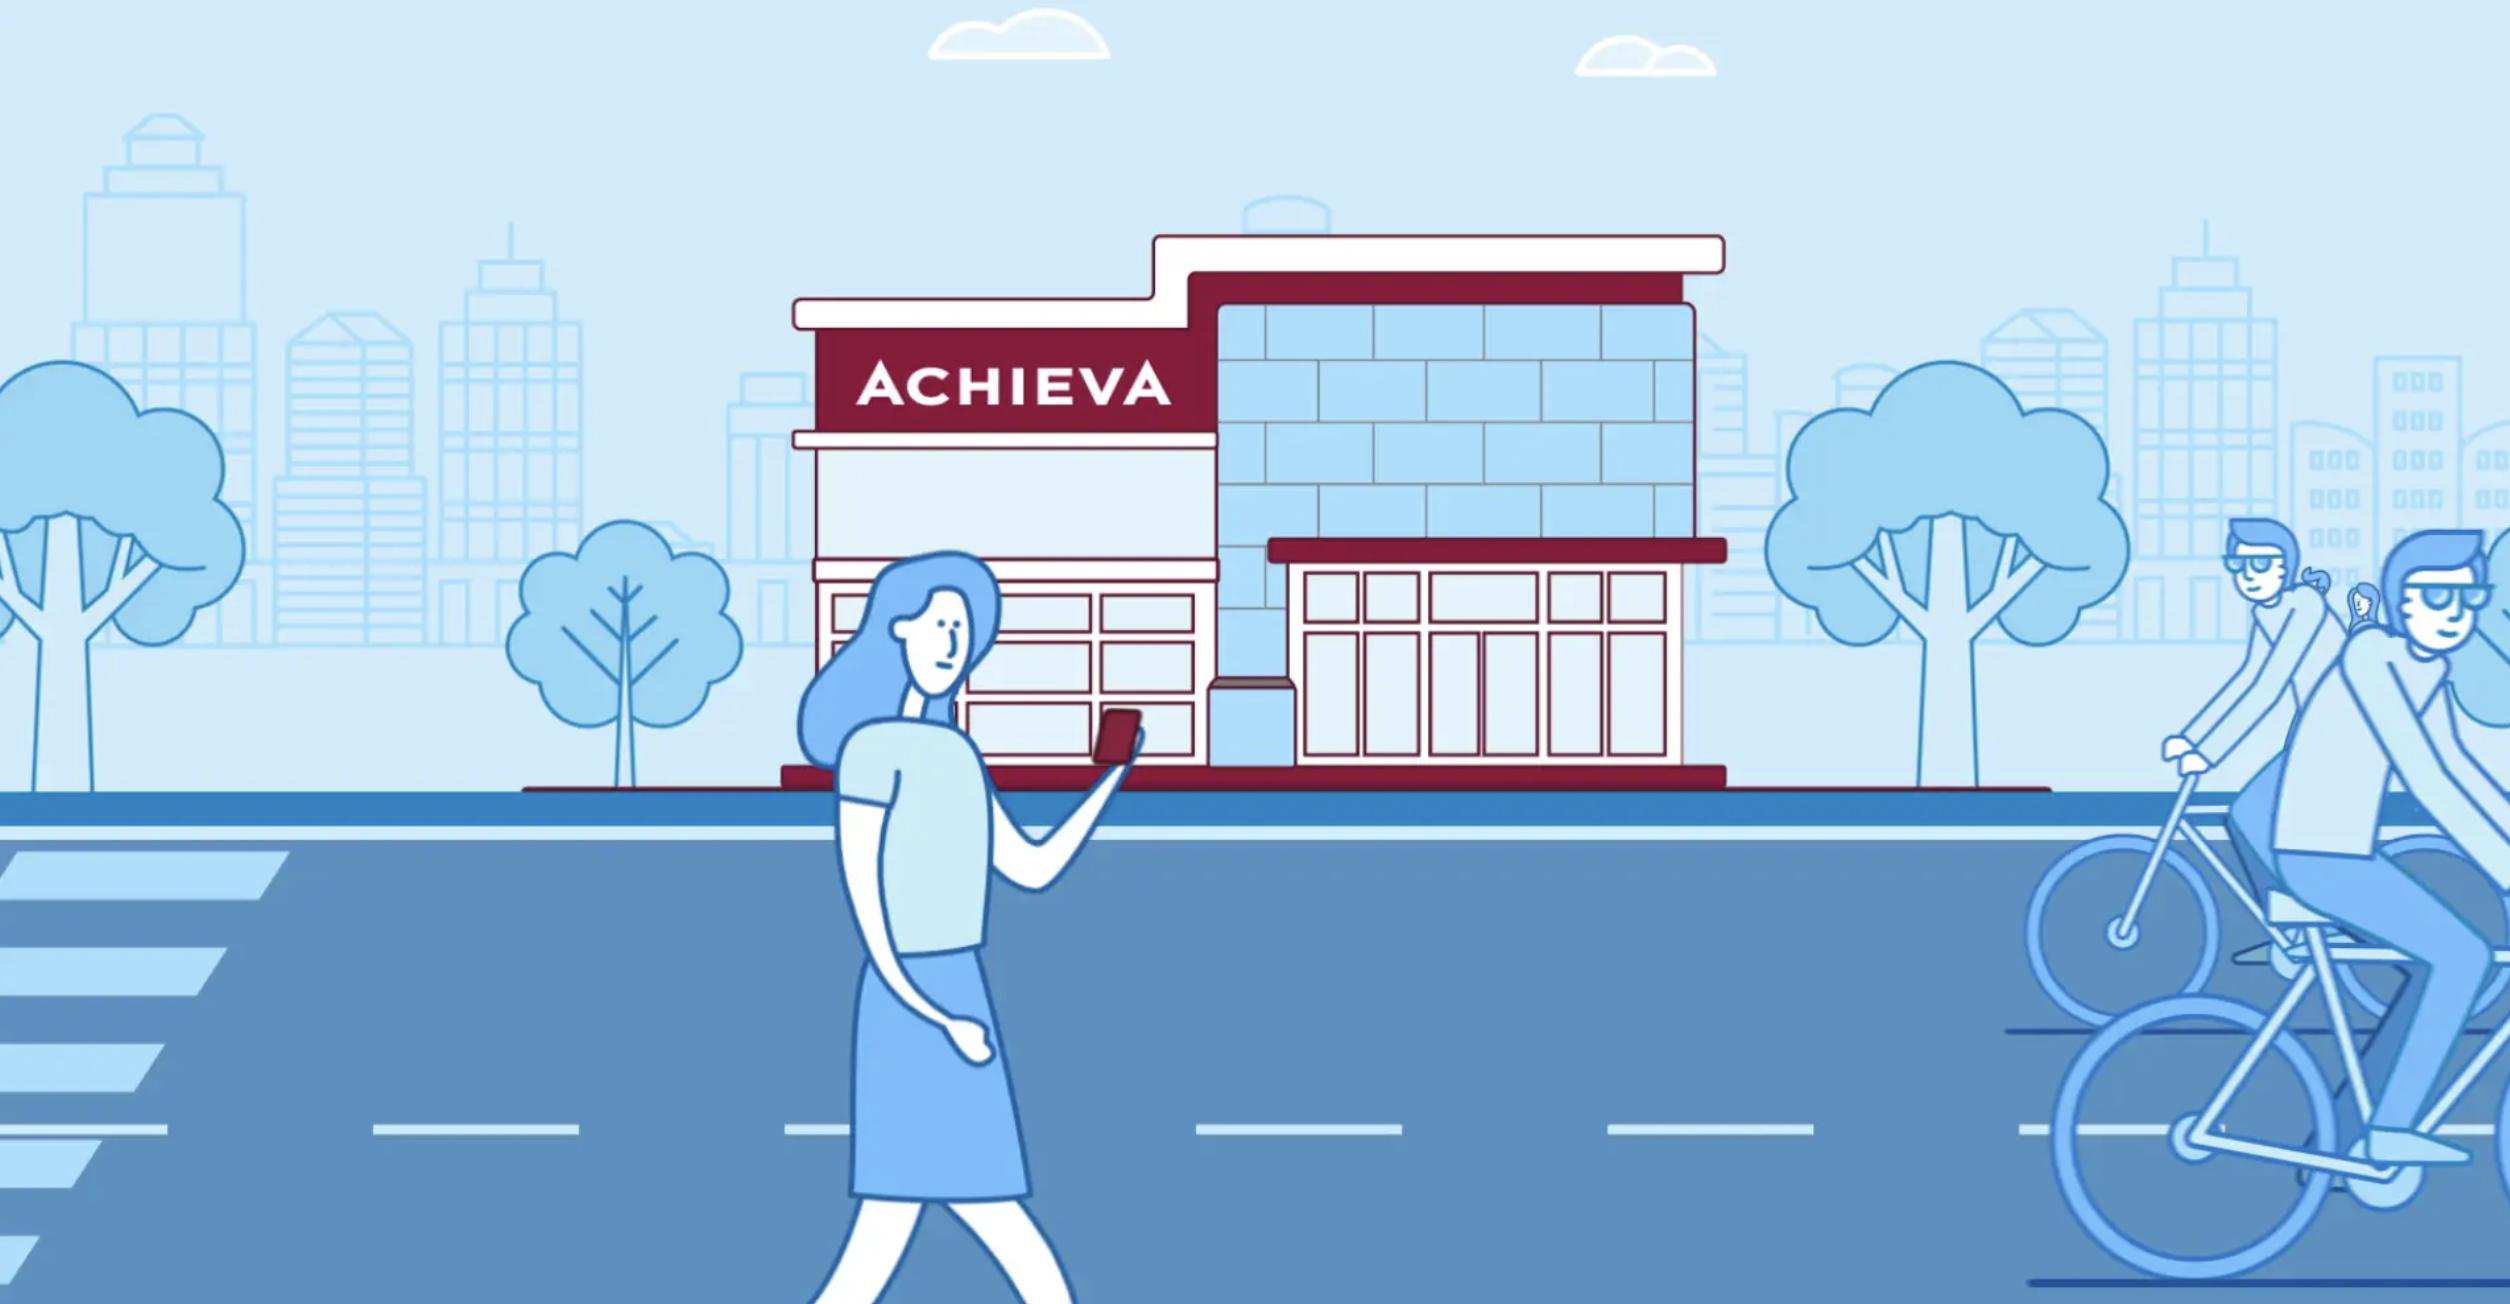 Achieva branch animation